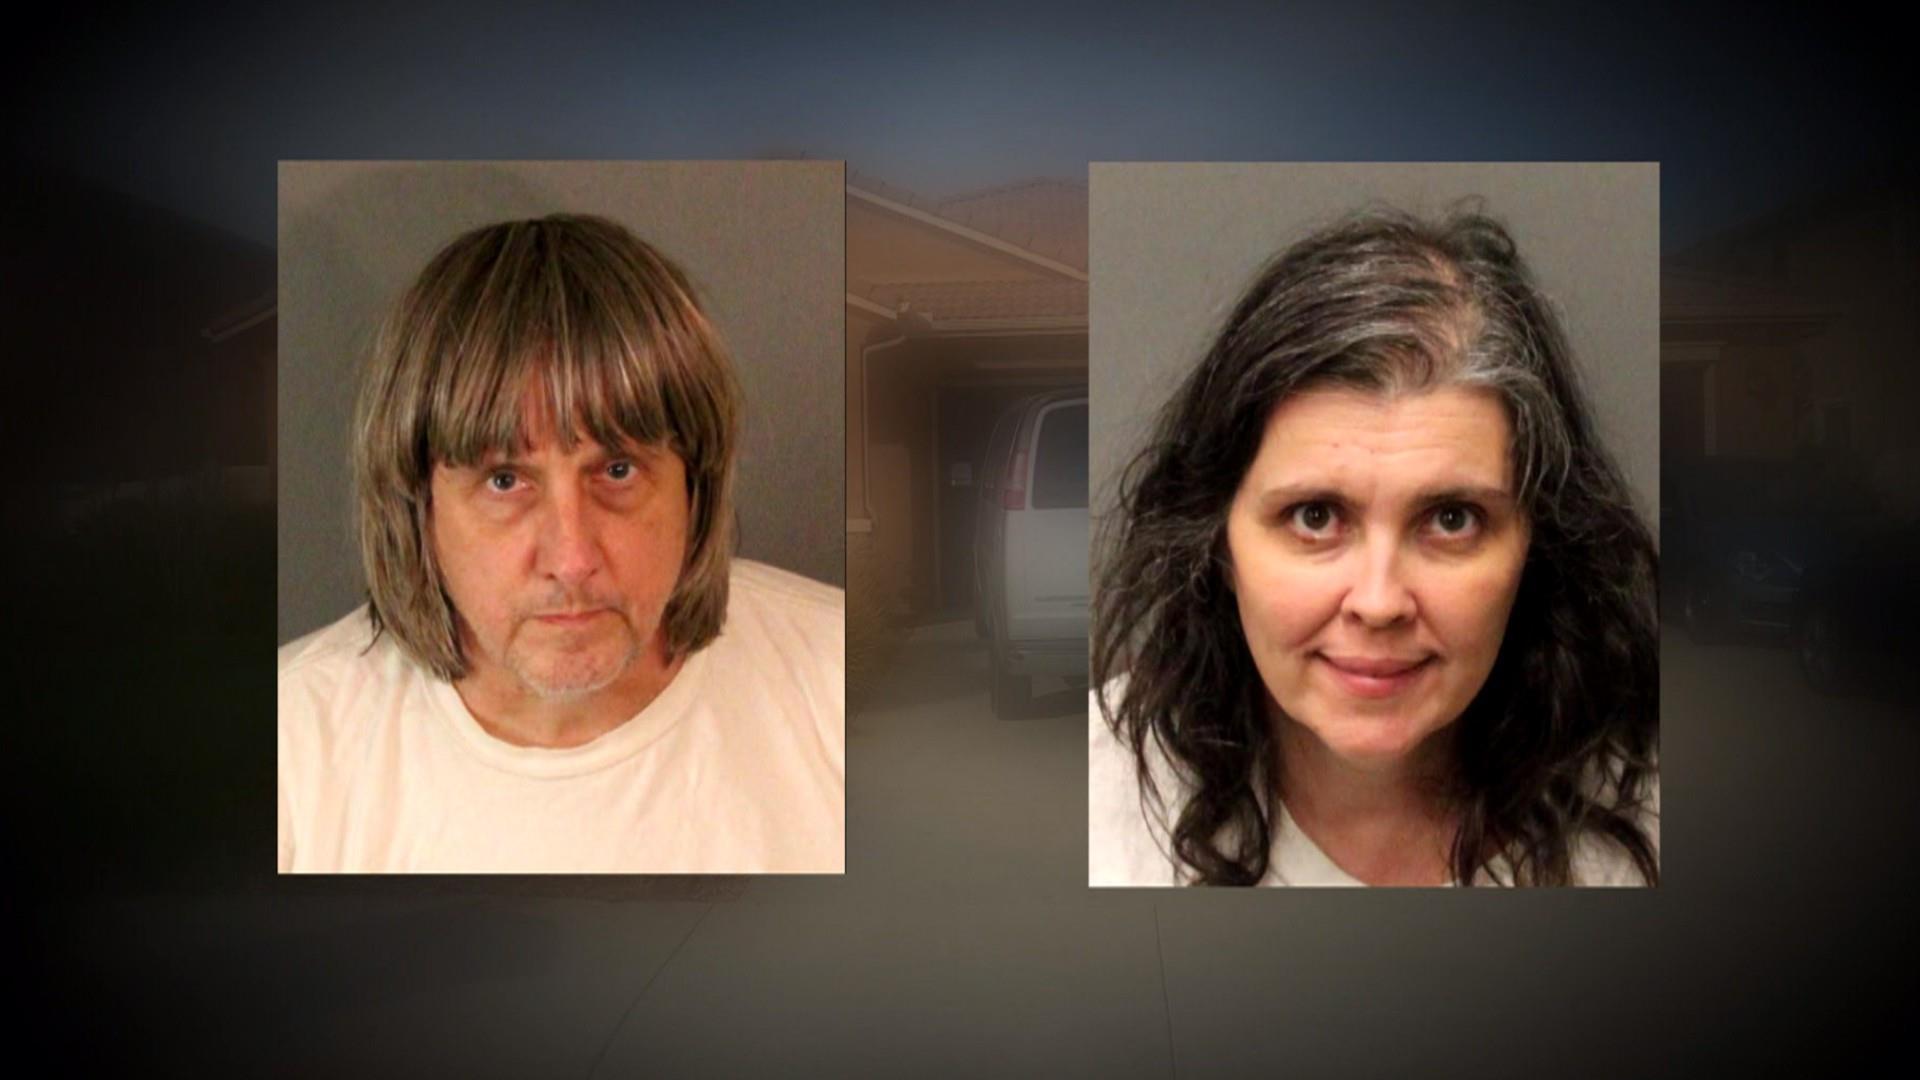 13 siblings found held captive in California